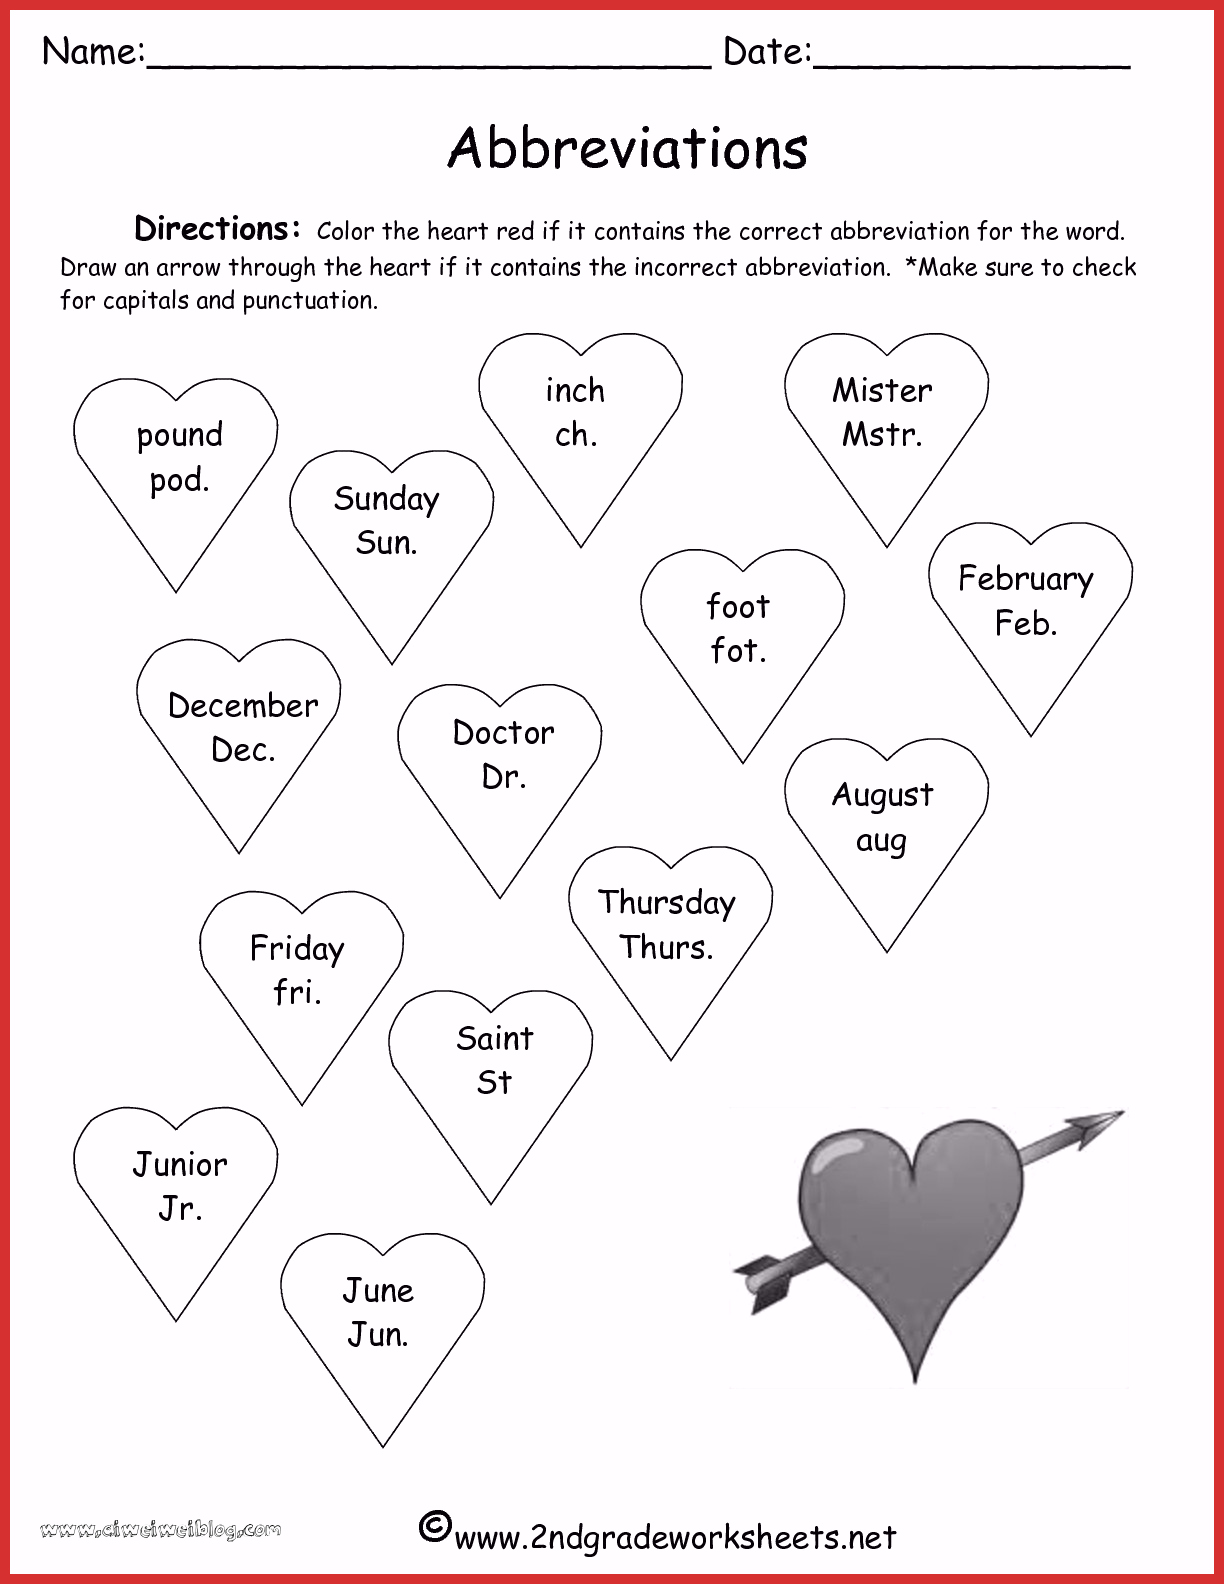 Valentine Day Worksheets For Preschoolers